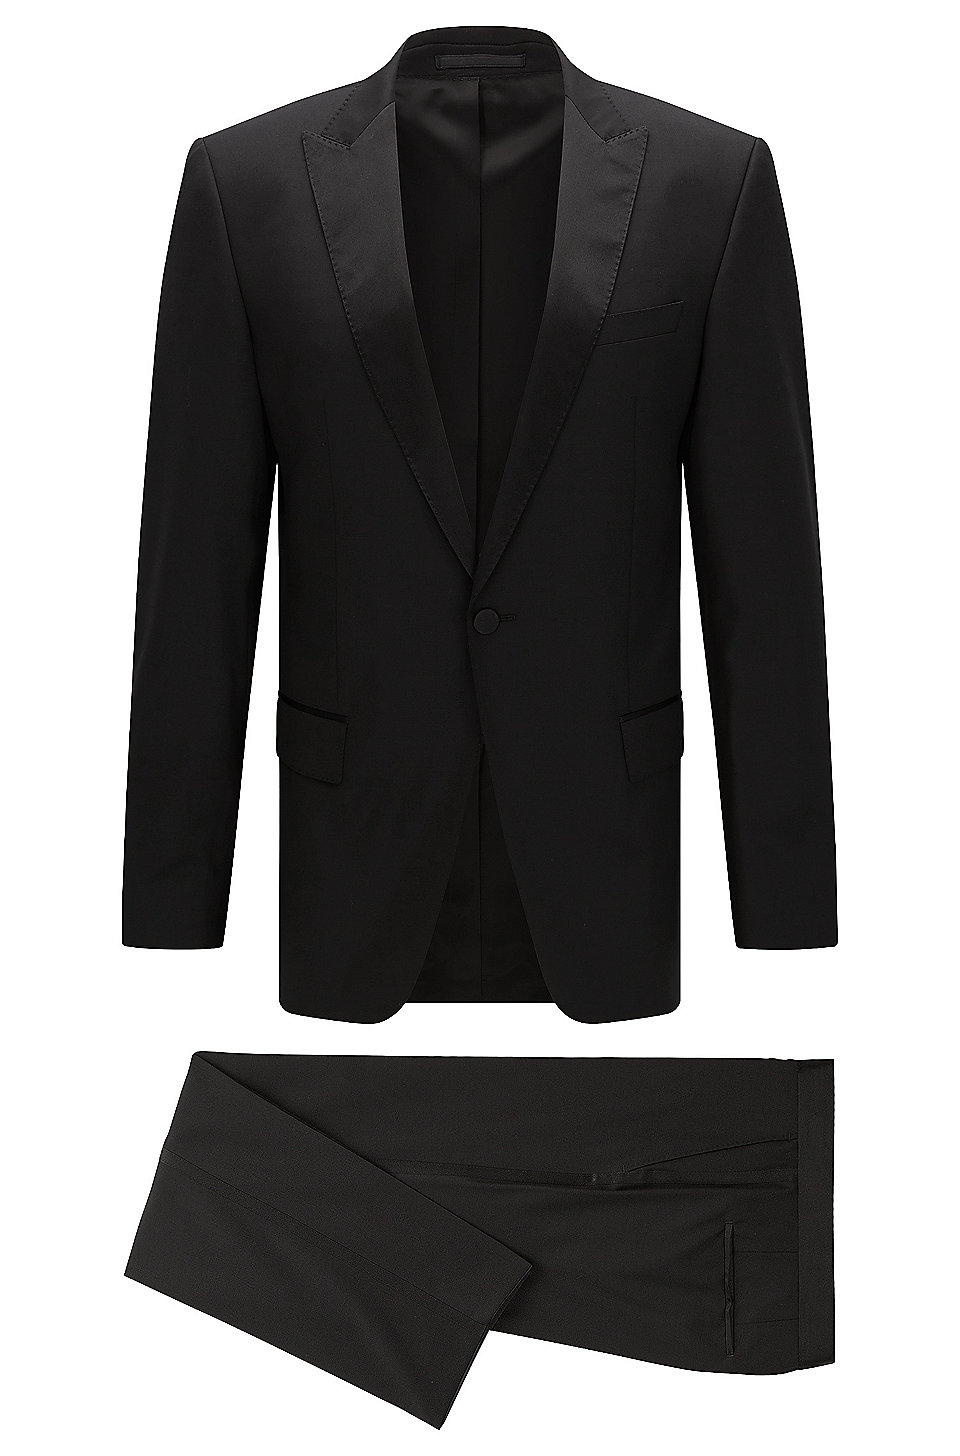 Virgin Wool Tuxedo, Slim Fit   Housten/Glorious, Black